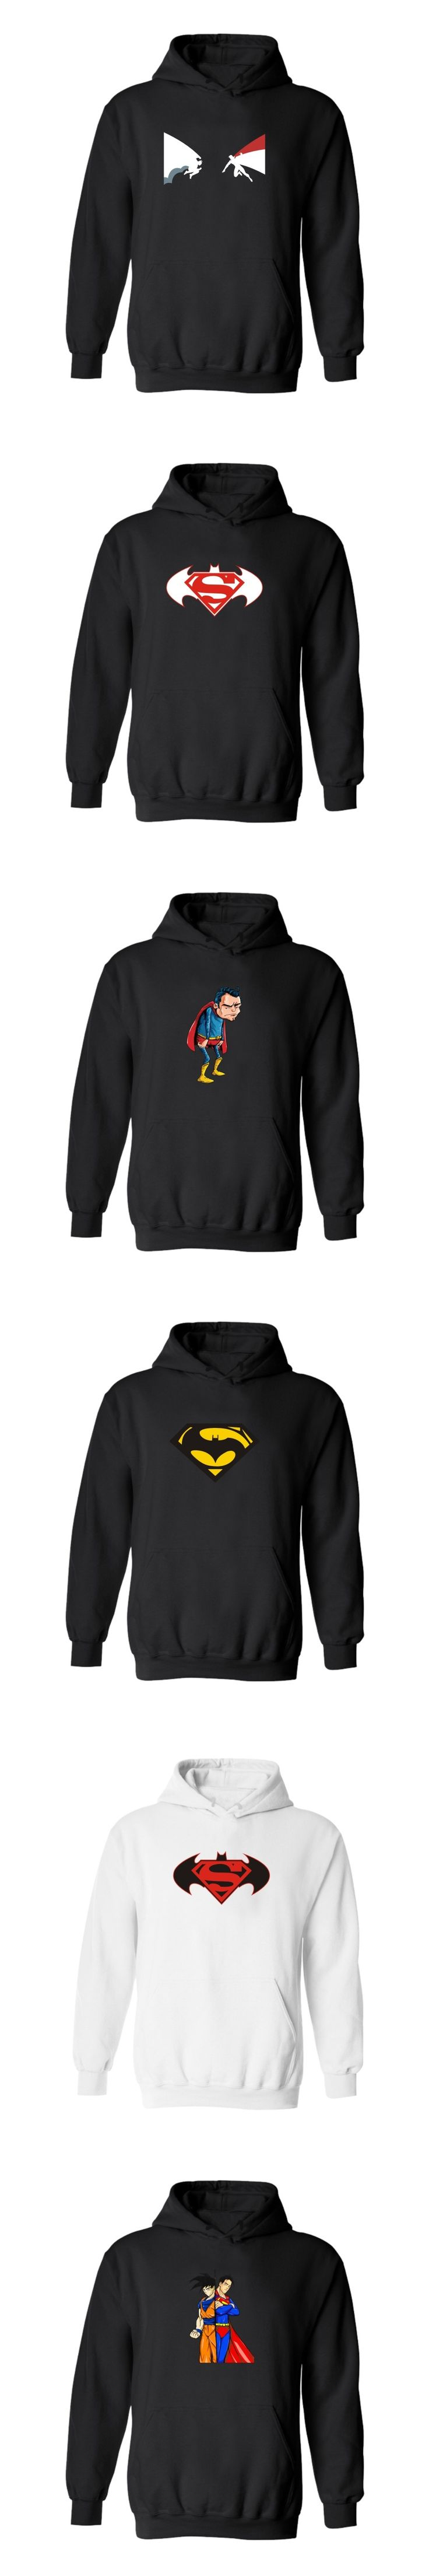 Superman VS Batman Hooded Mens Hoodies And Sweatshirts Cartoon Super Hero 4XL Hoodies Men Hip Hop Winter Fashion Funny Clothes